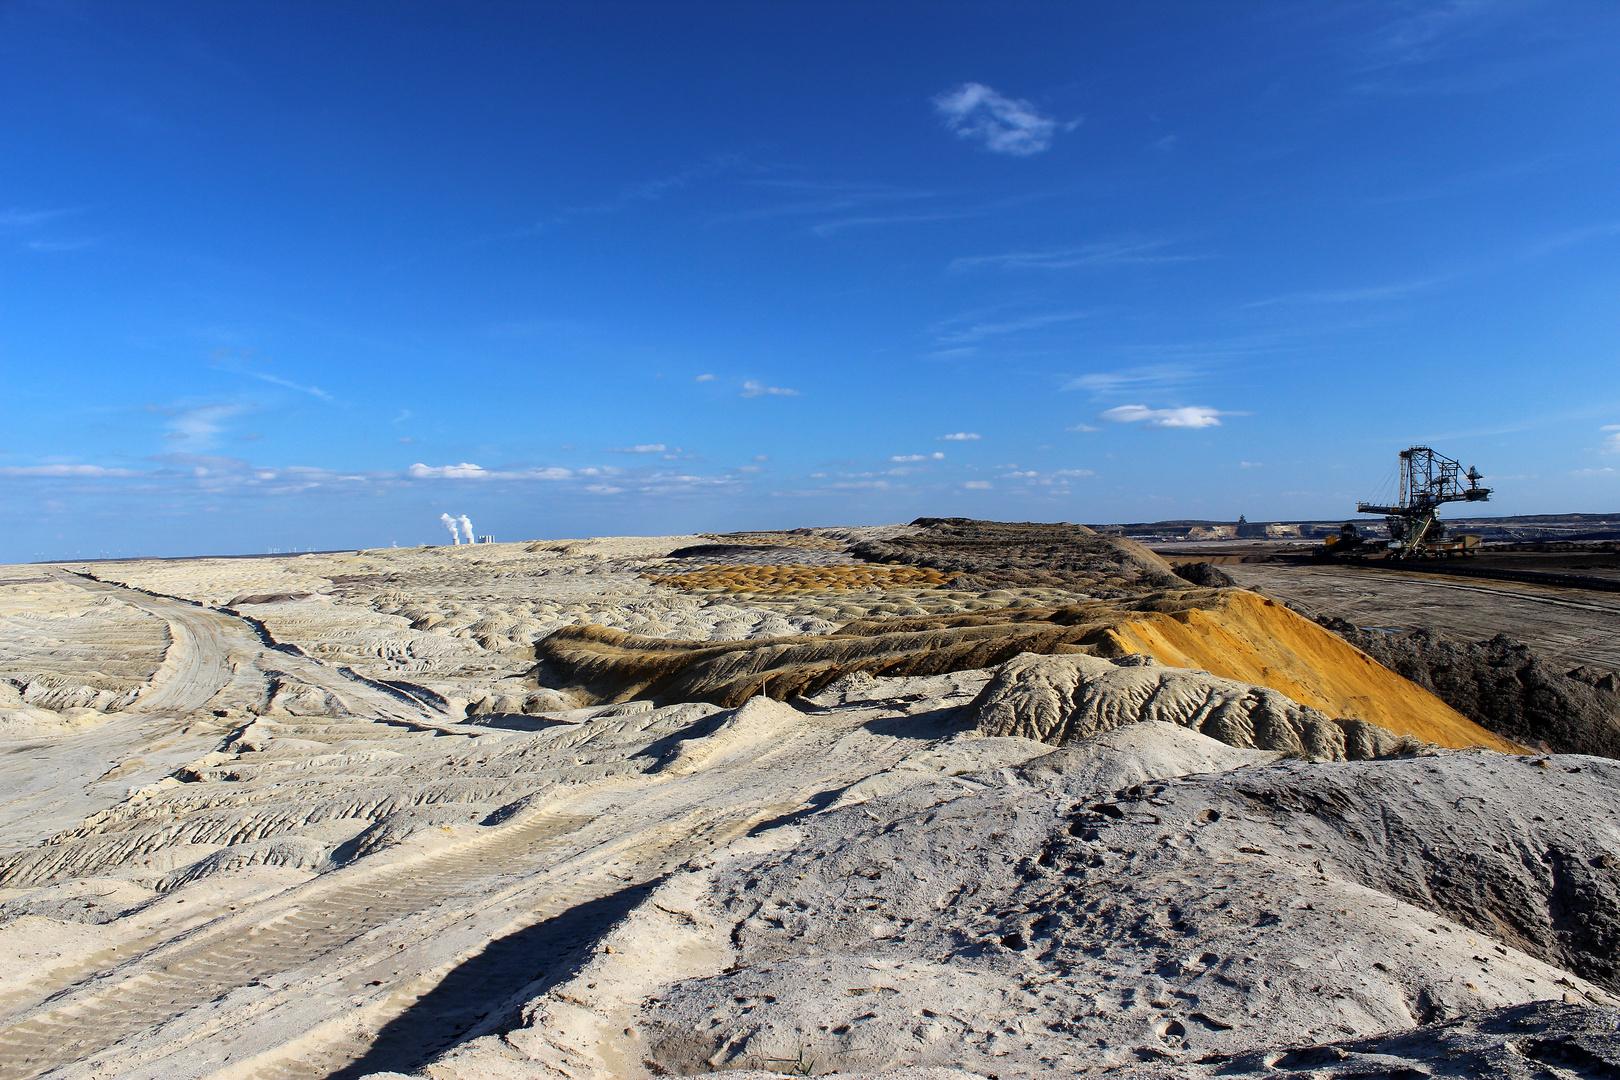 Tagebau Mondlandschaft